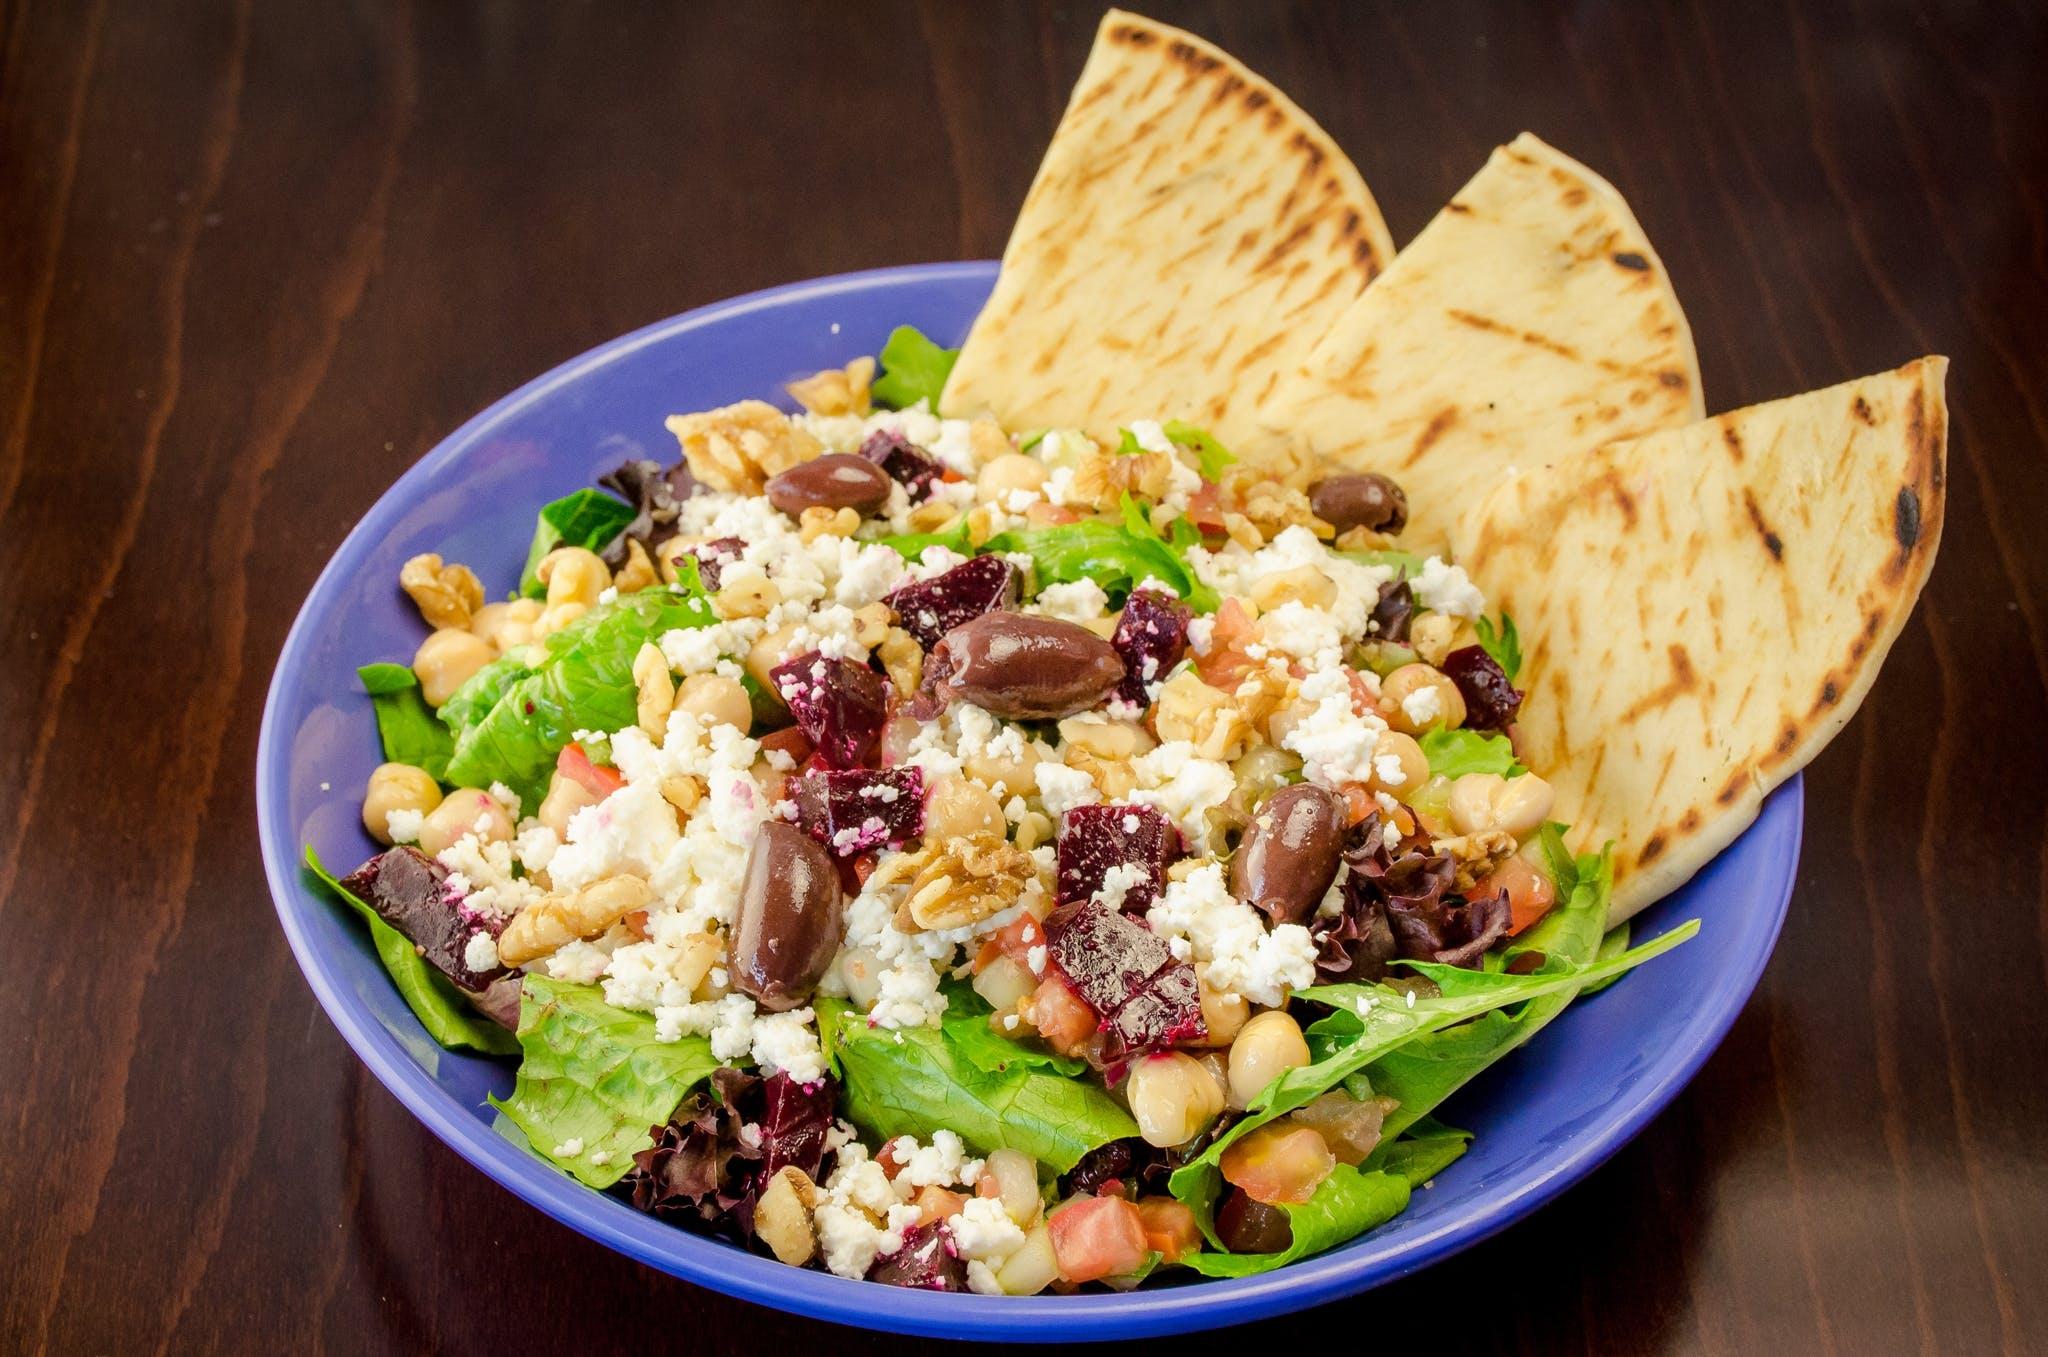 Mediterranean Garbanzo Salad from Freska Mediterranean Grill in Middleton, WI